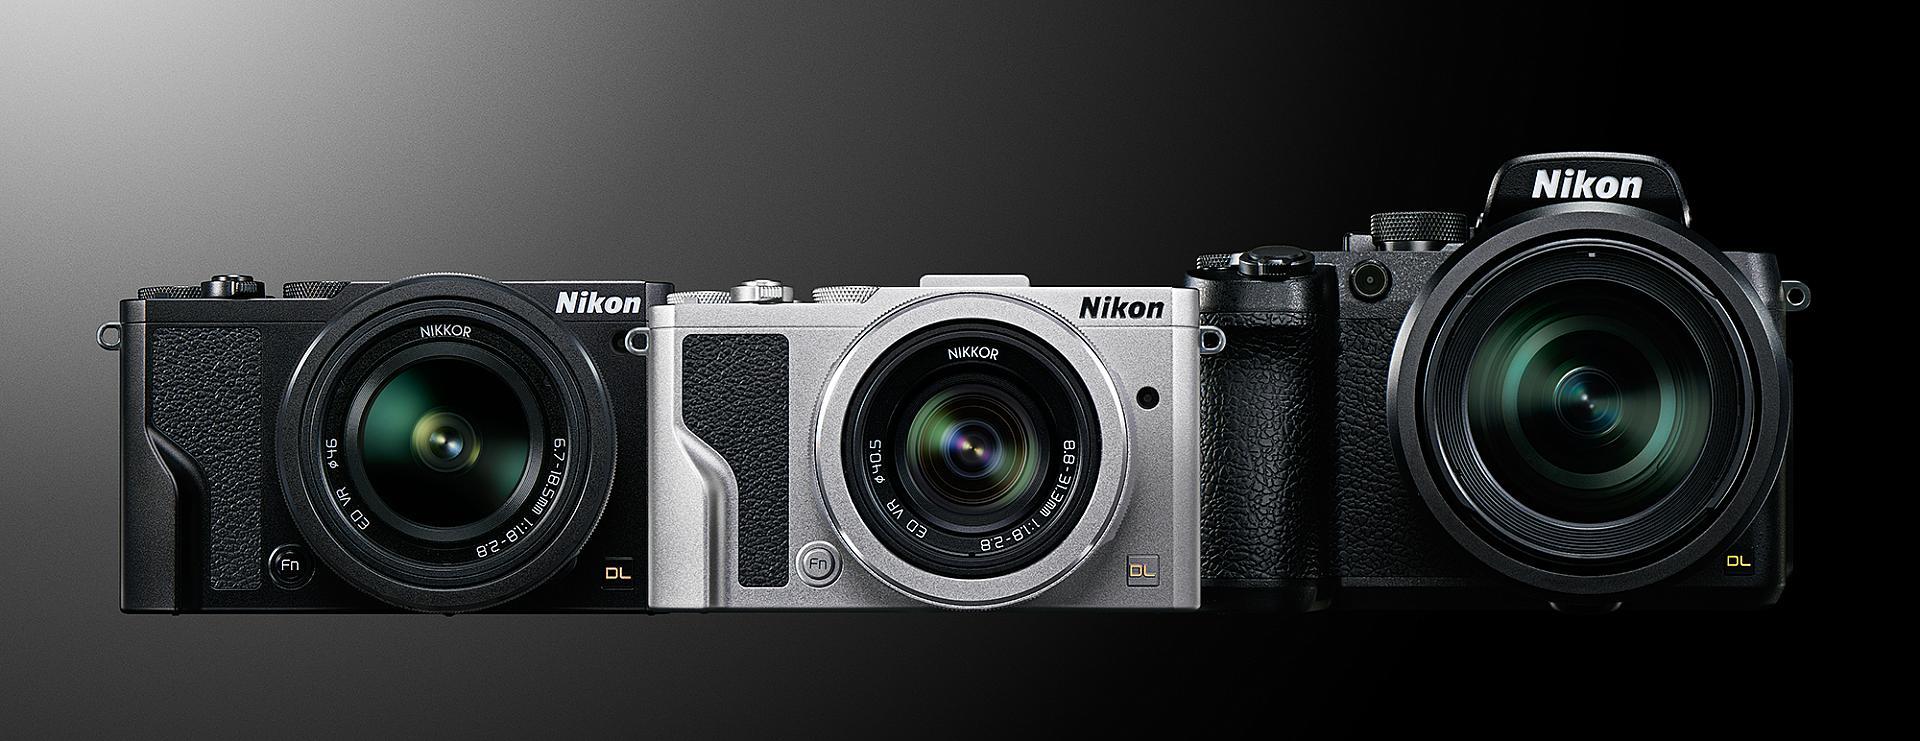 Nikons alla nya DL-kompakter.